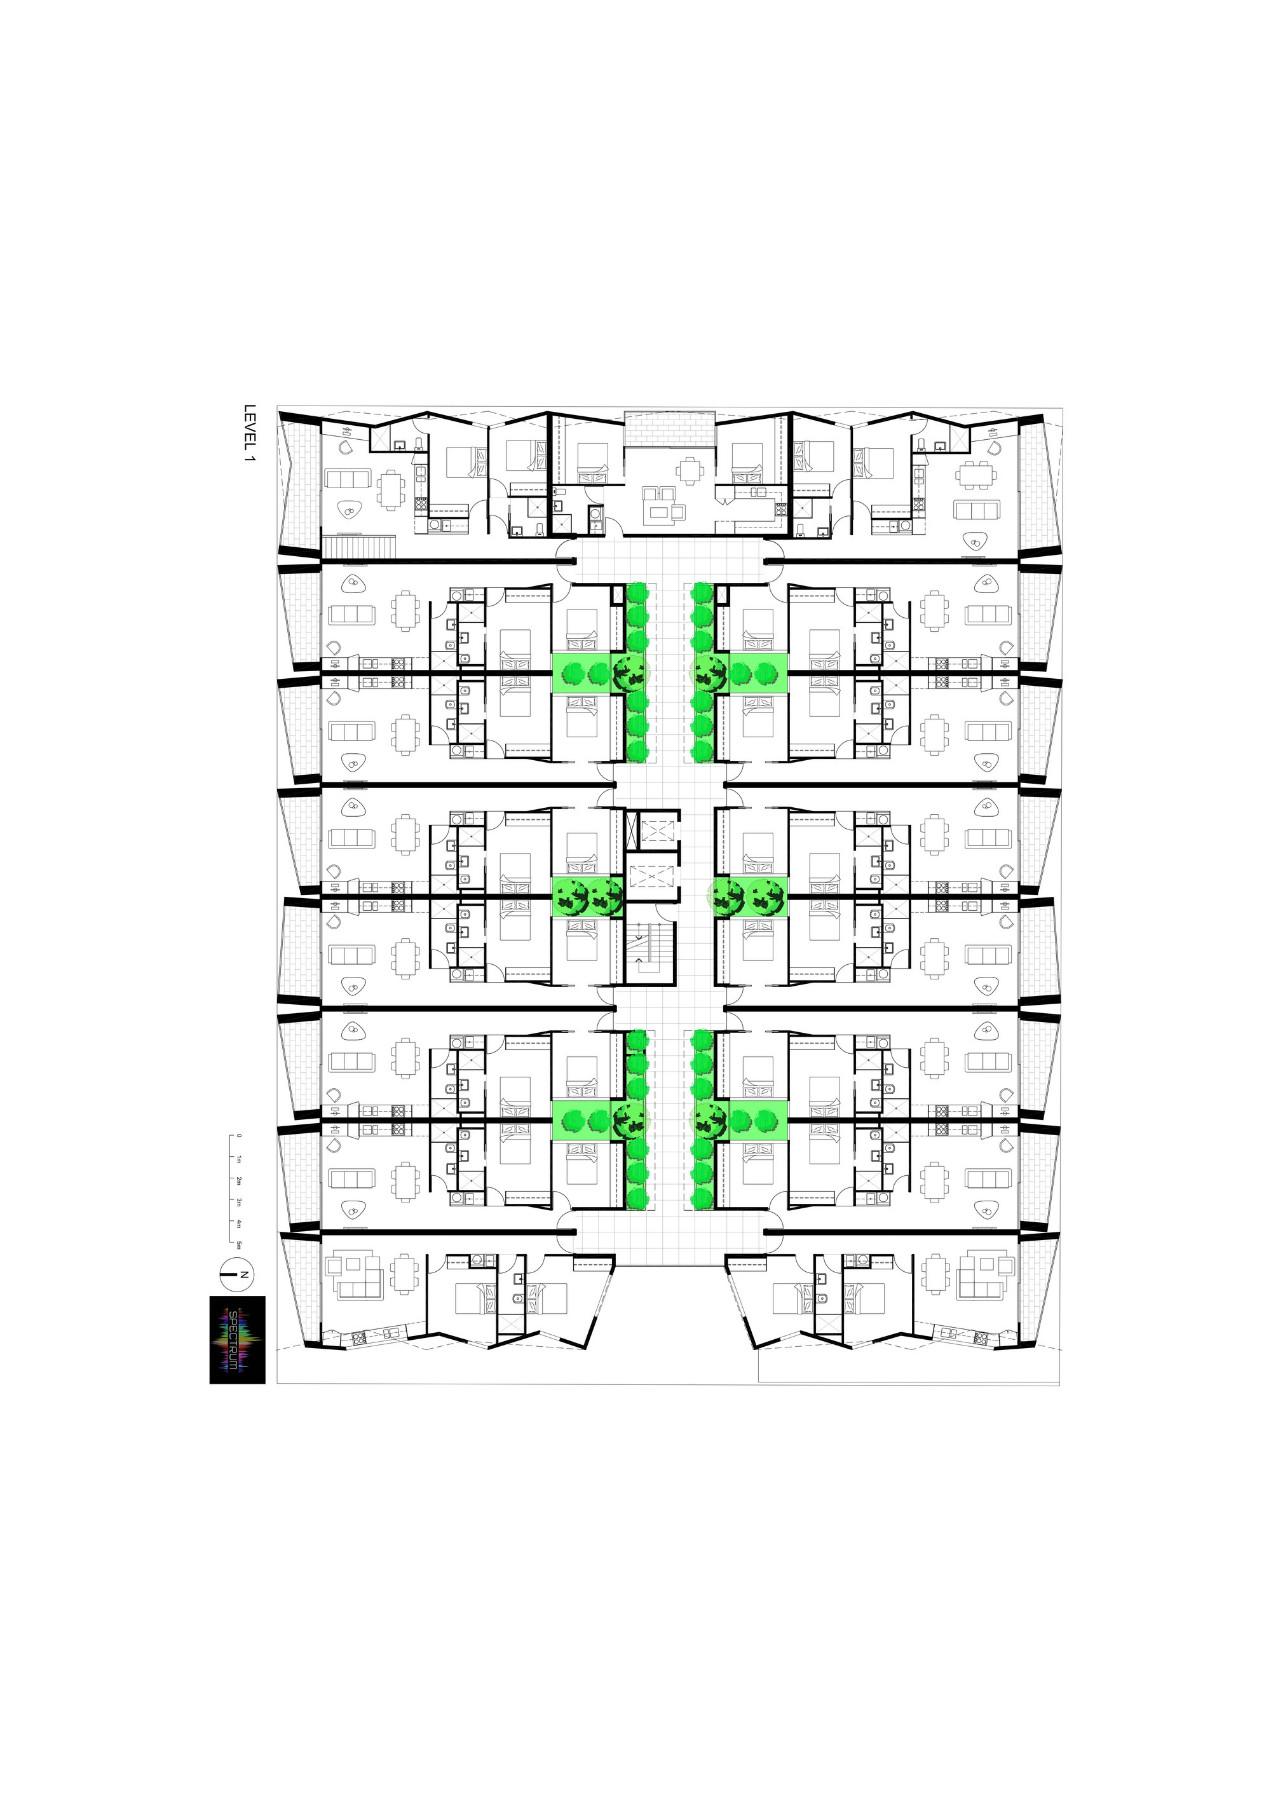 Spectrum Apartments floor plans